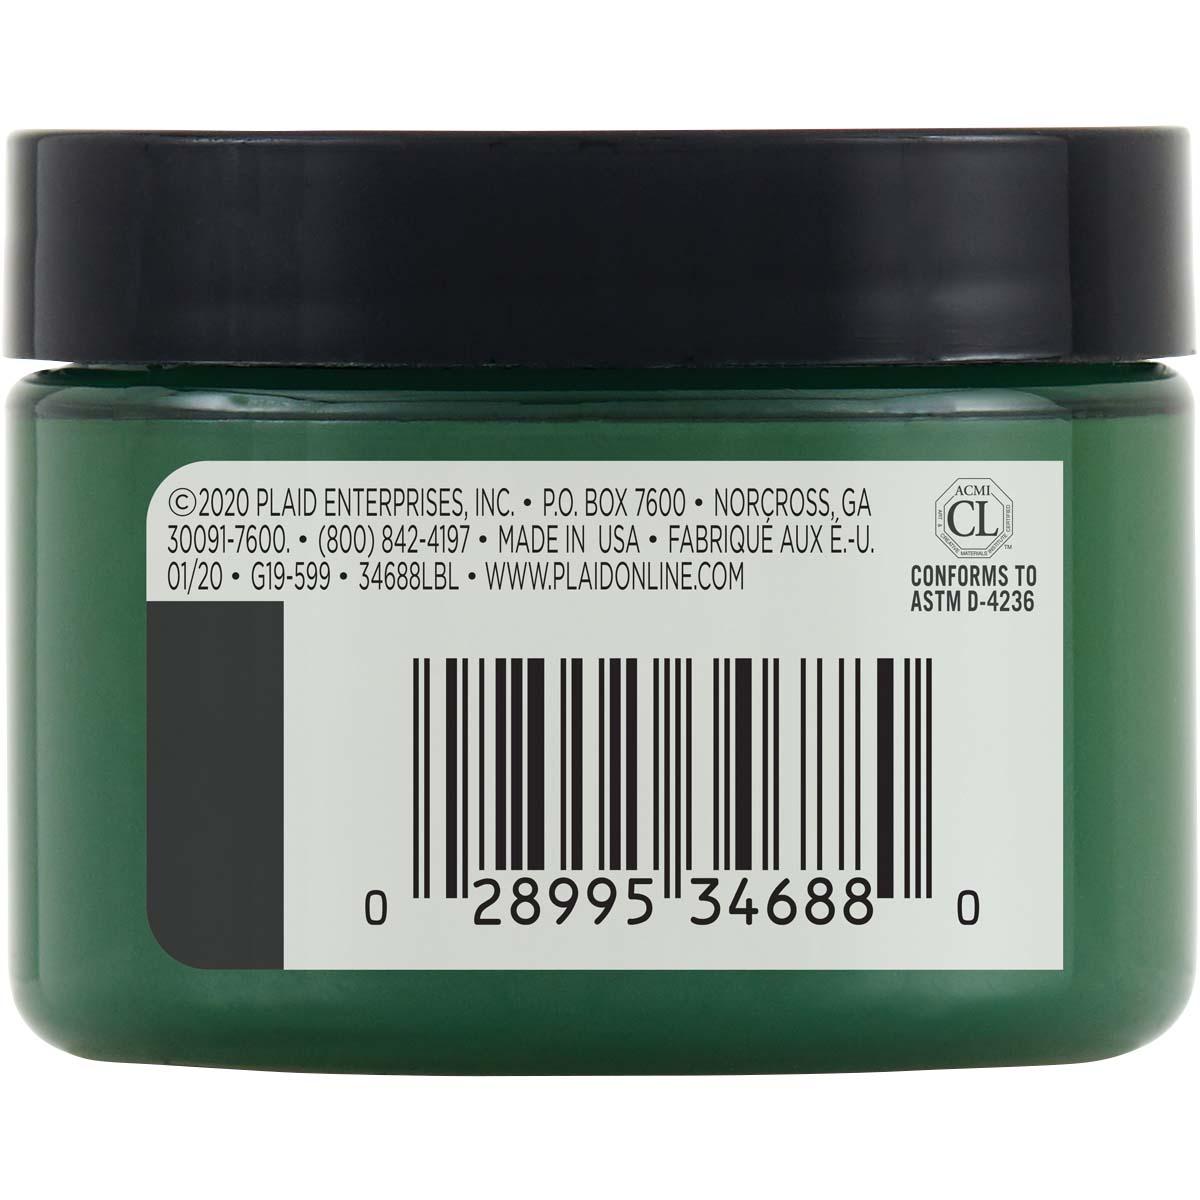 FolkArt ® Design Creme™ - Aged Pine, 3 oz. - 34688